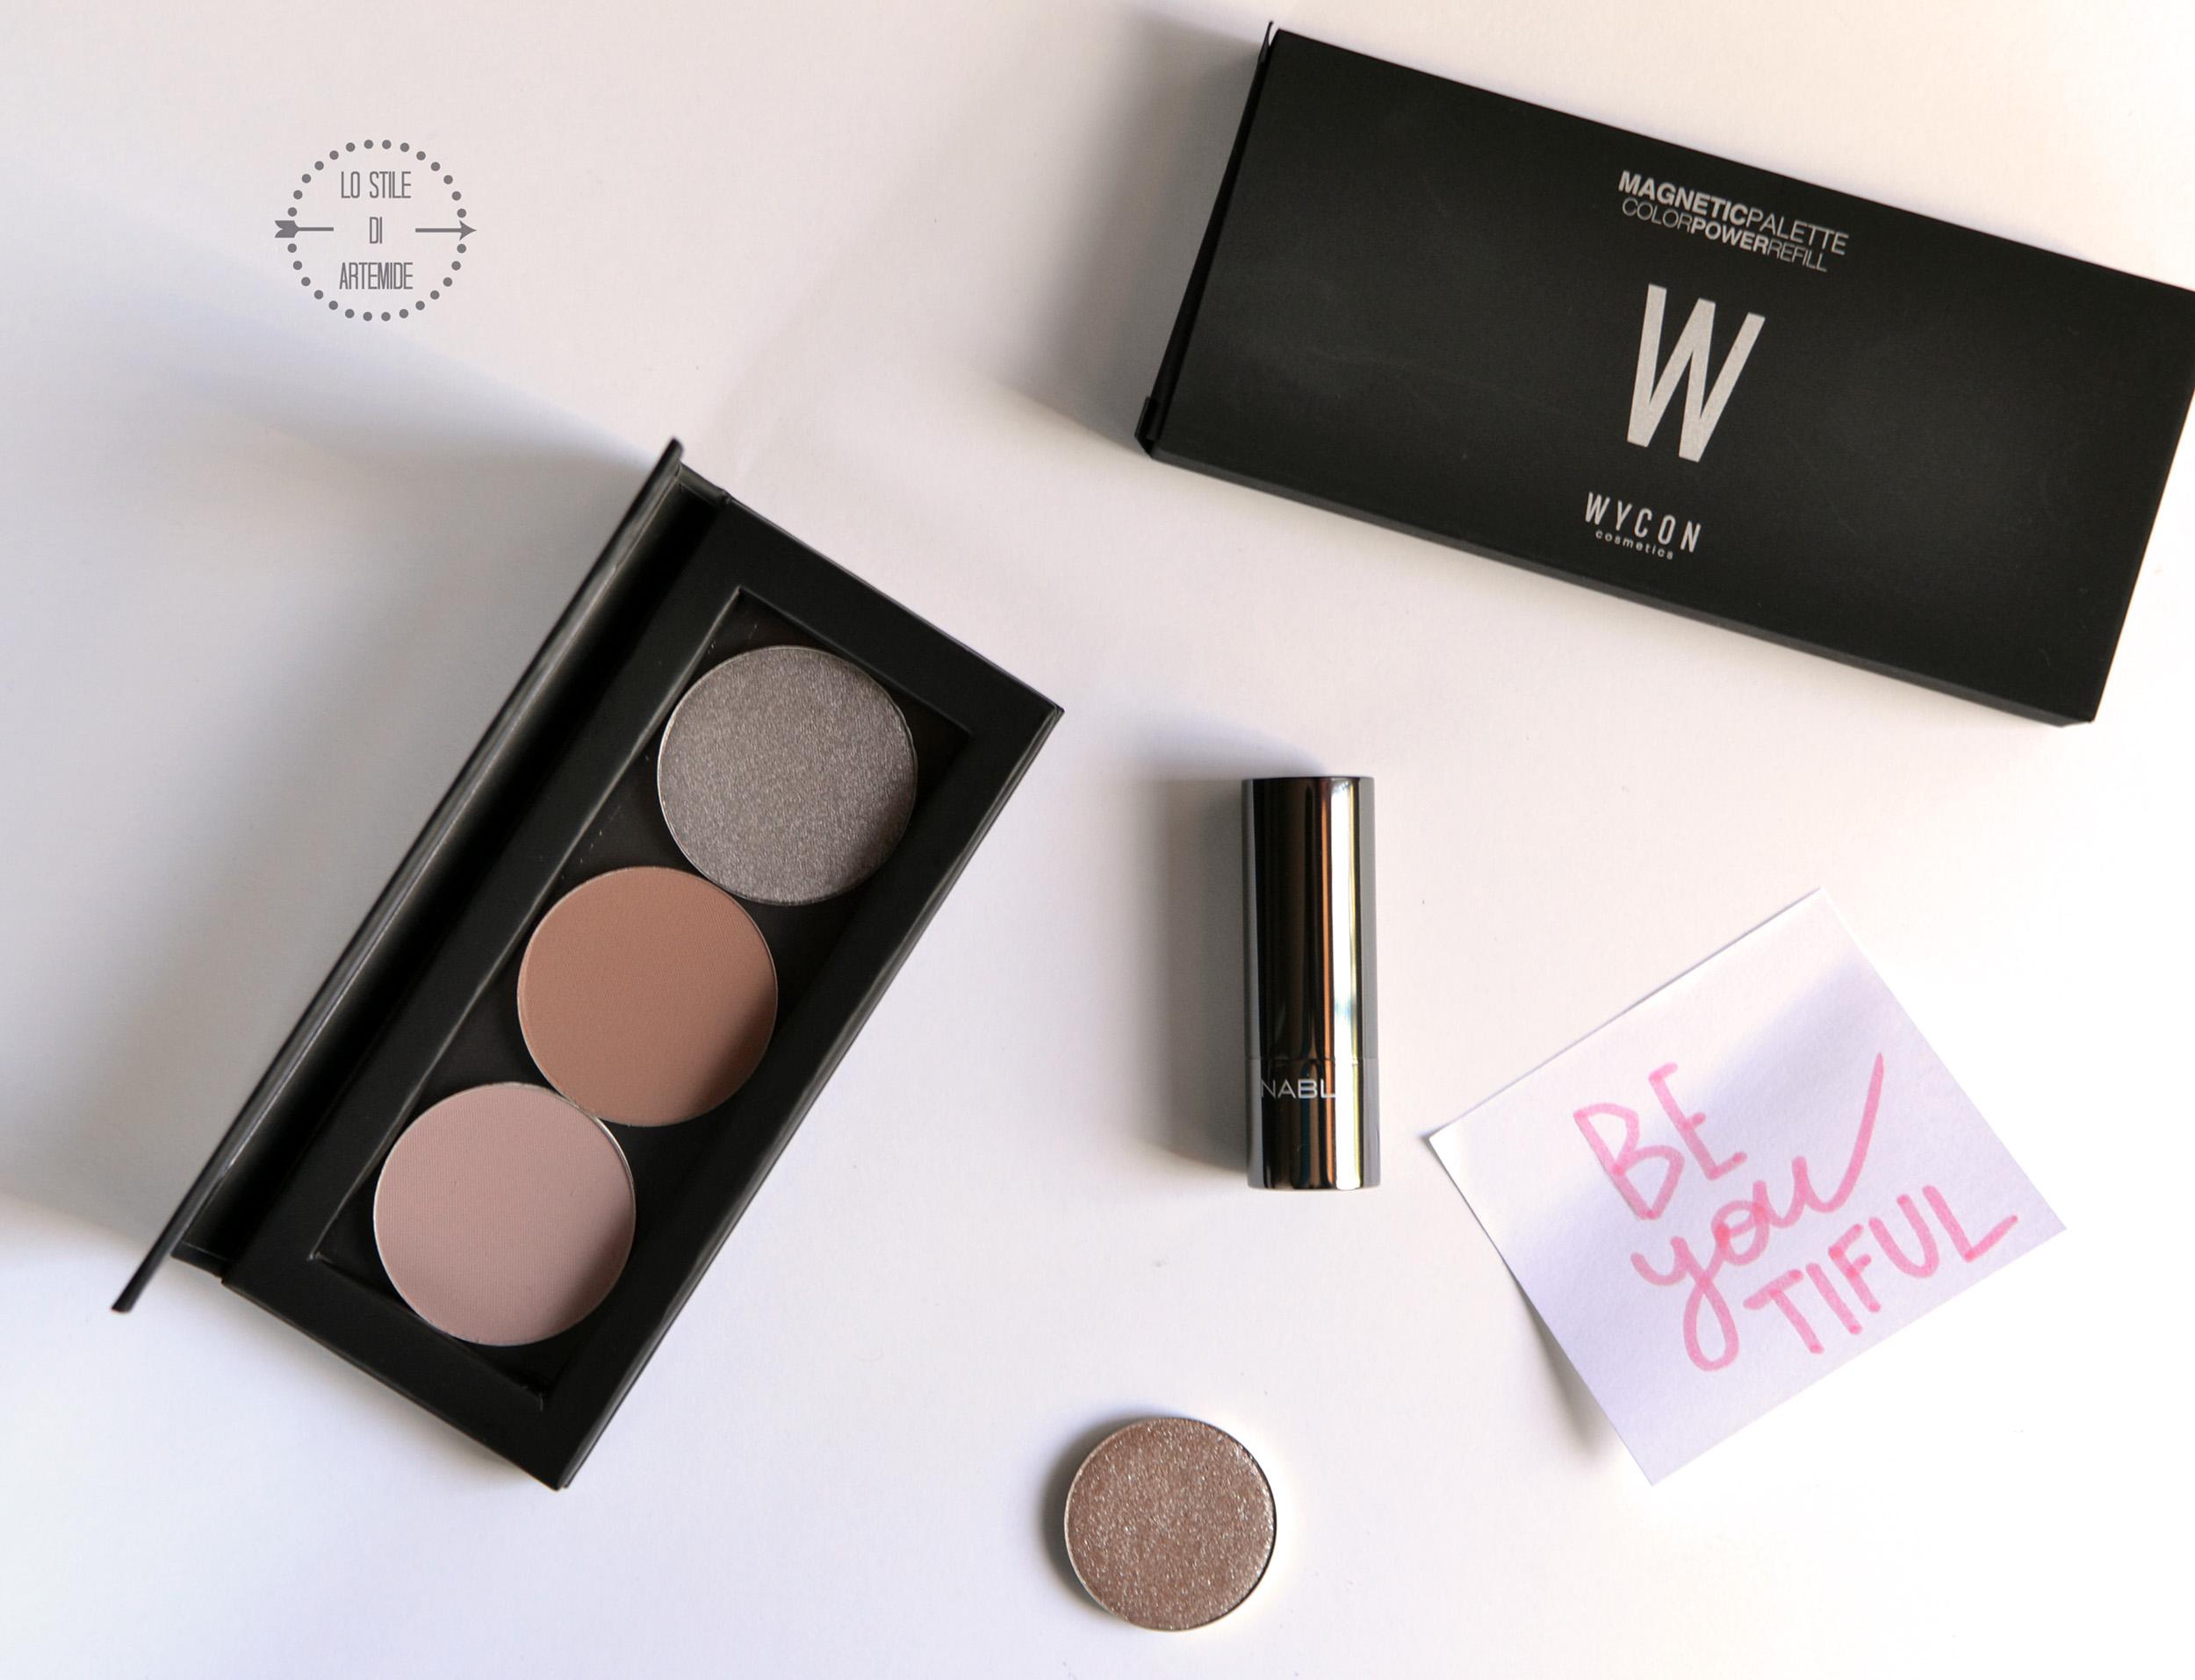 app webank per gli acquisti online di make-up